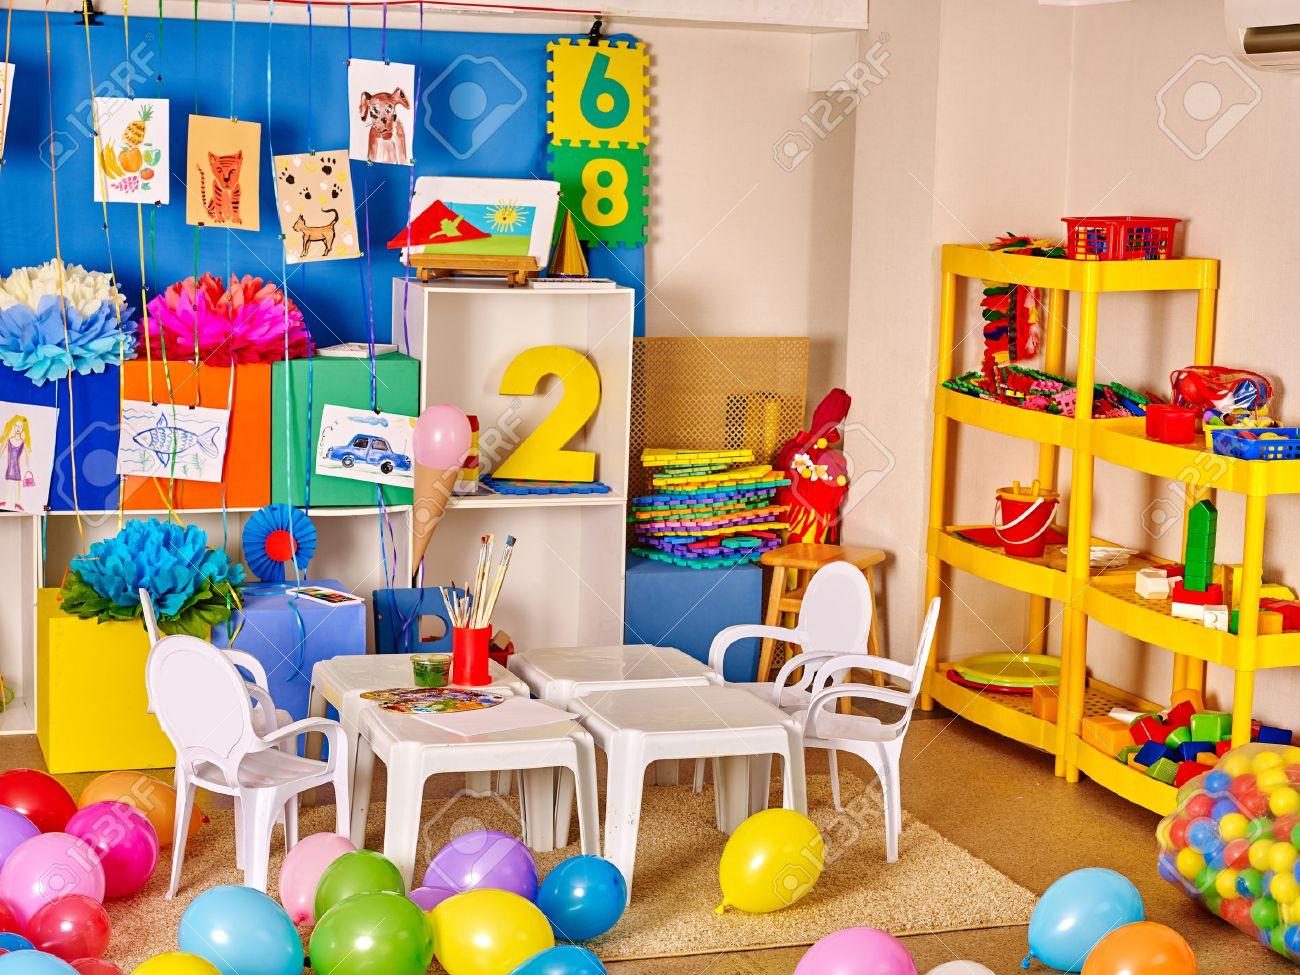 Interior of kids game room with toys in kindergarten. - 51119781